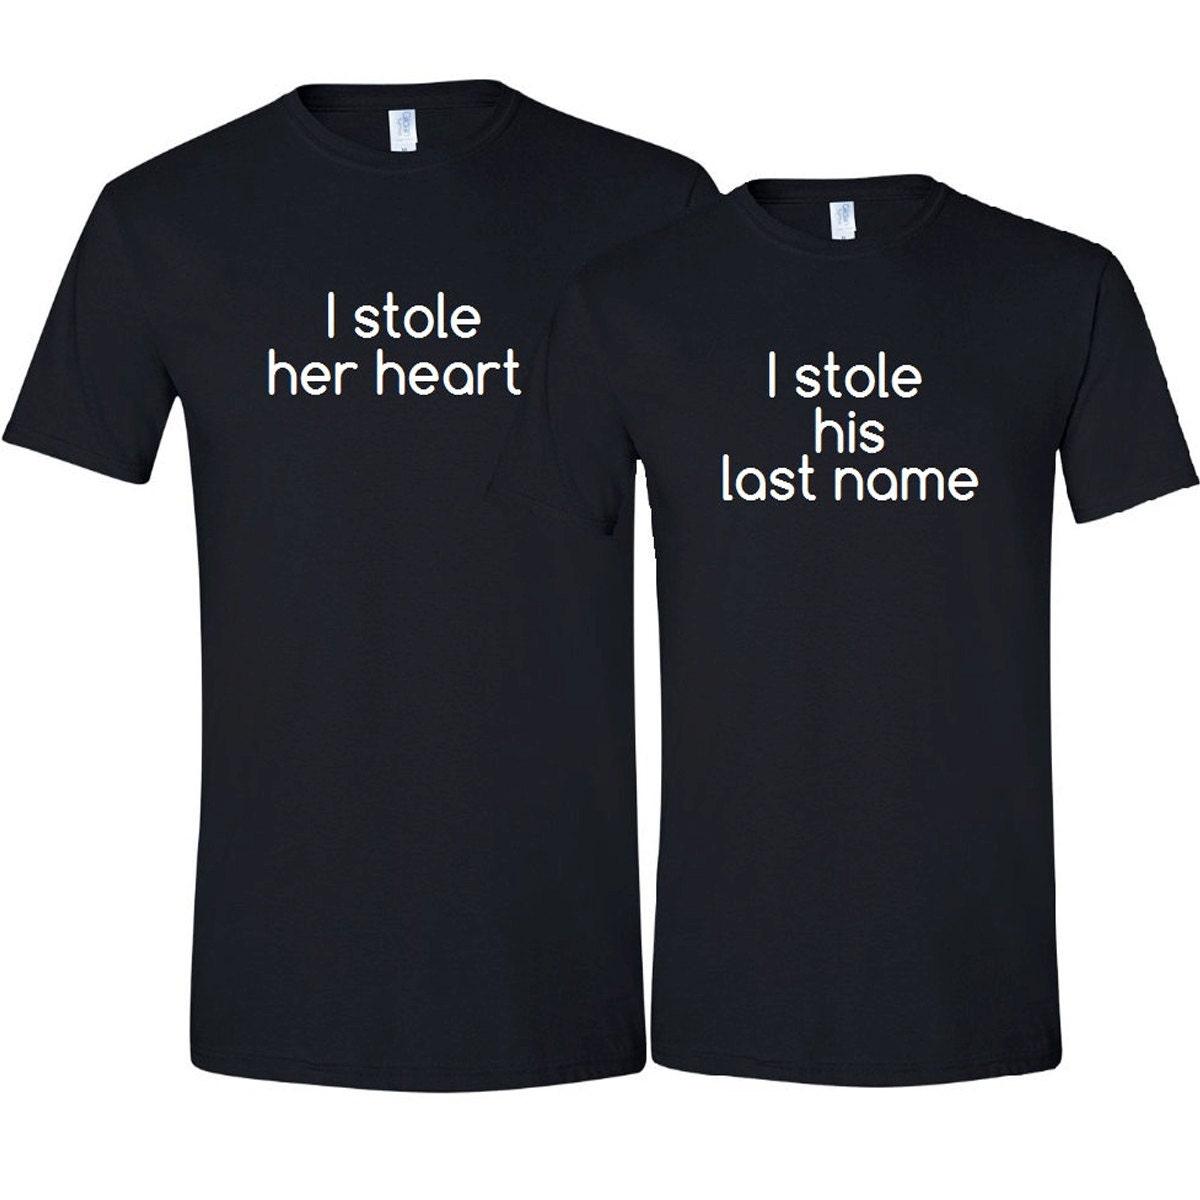 shirt design ideas pinterest project cope t shirt design zoom